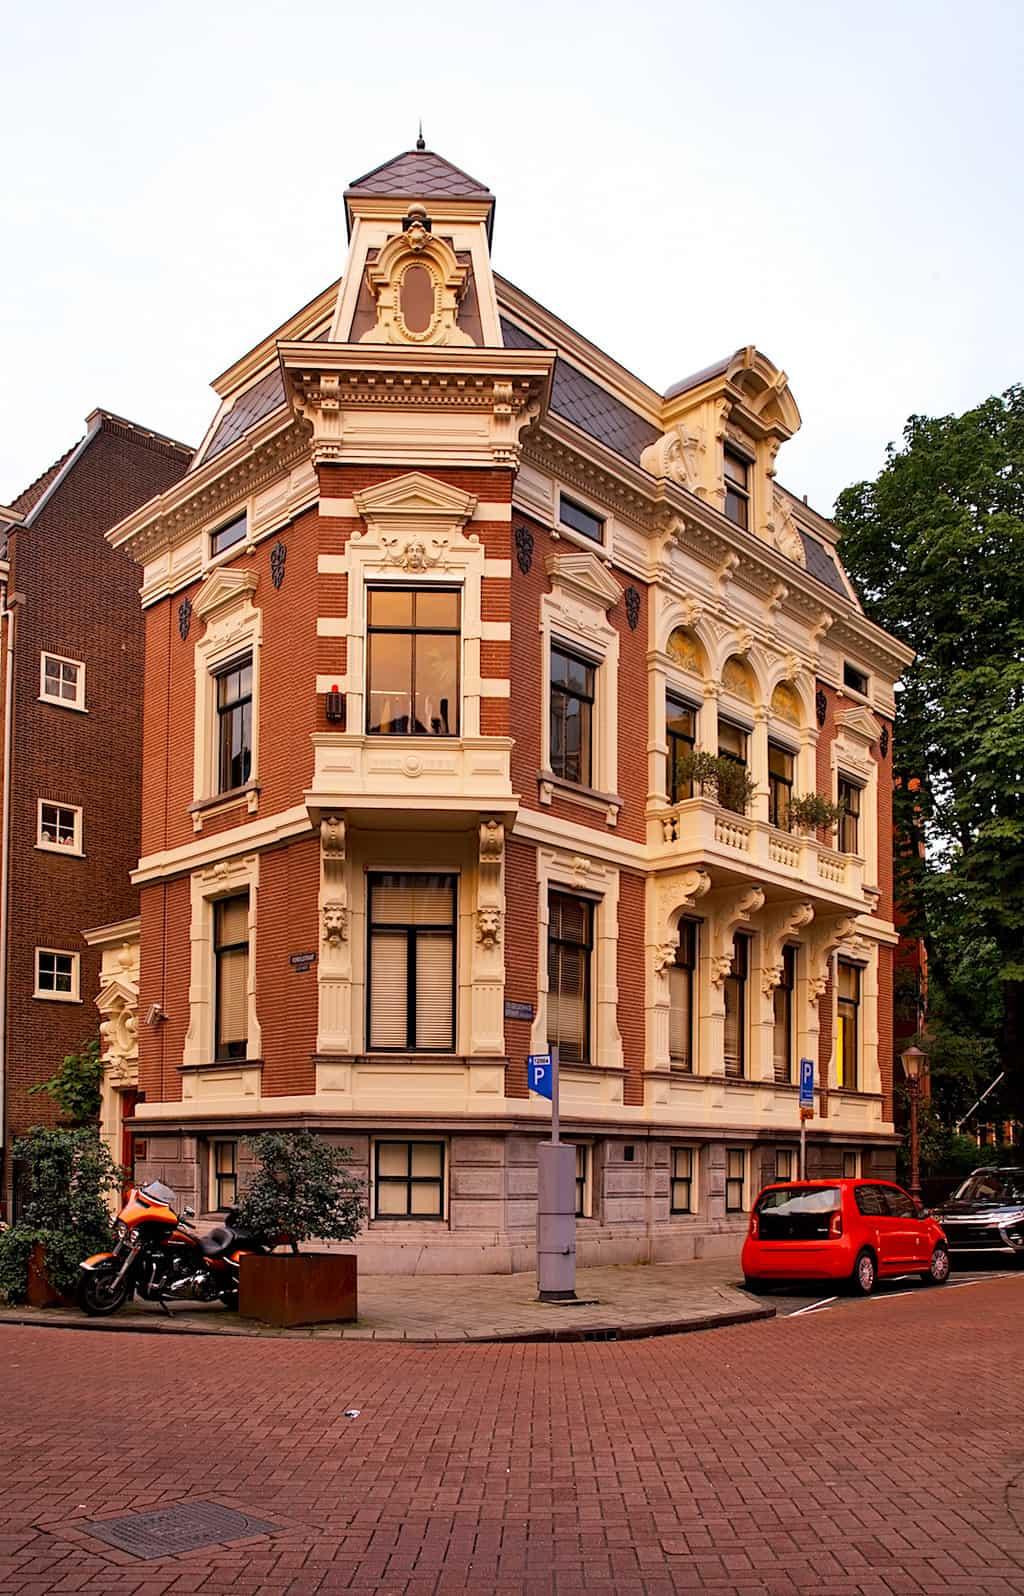 A house on Vondelstraat street in Amsterdam. Netherlands